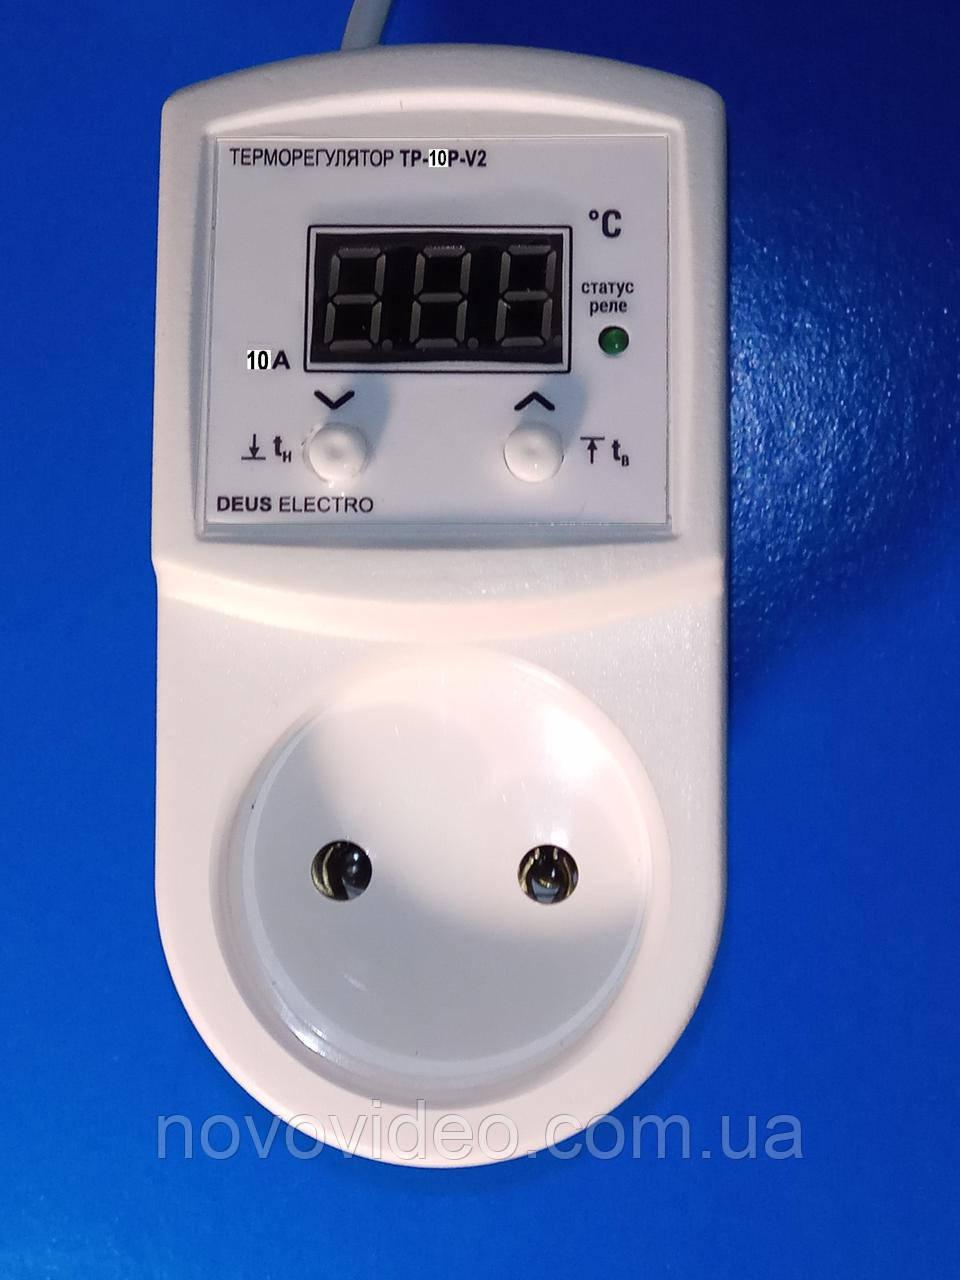 Терморегулятор цифровой в розетку для отопления ТР-10Р-V2 на 10А